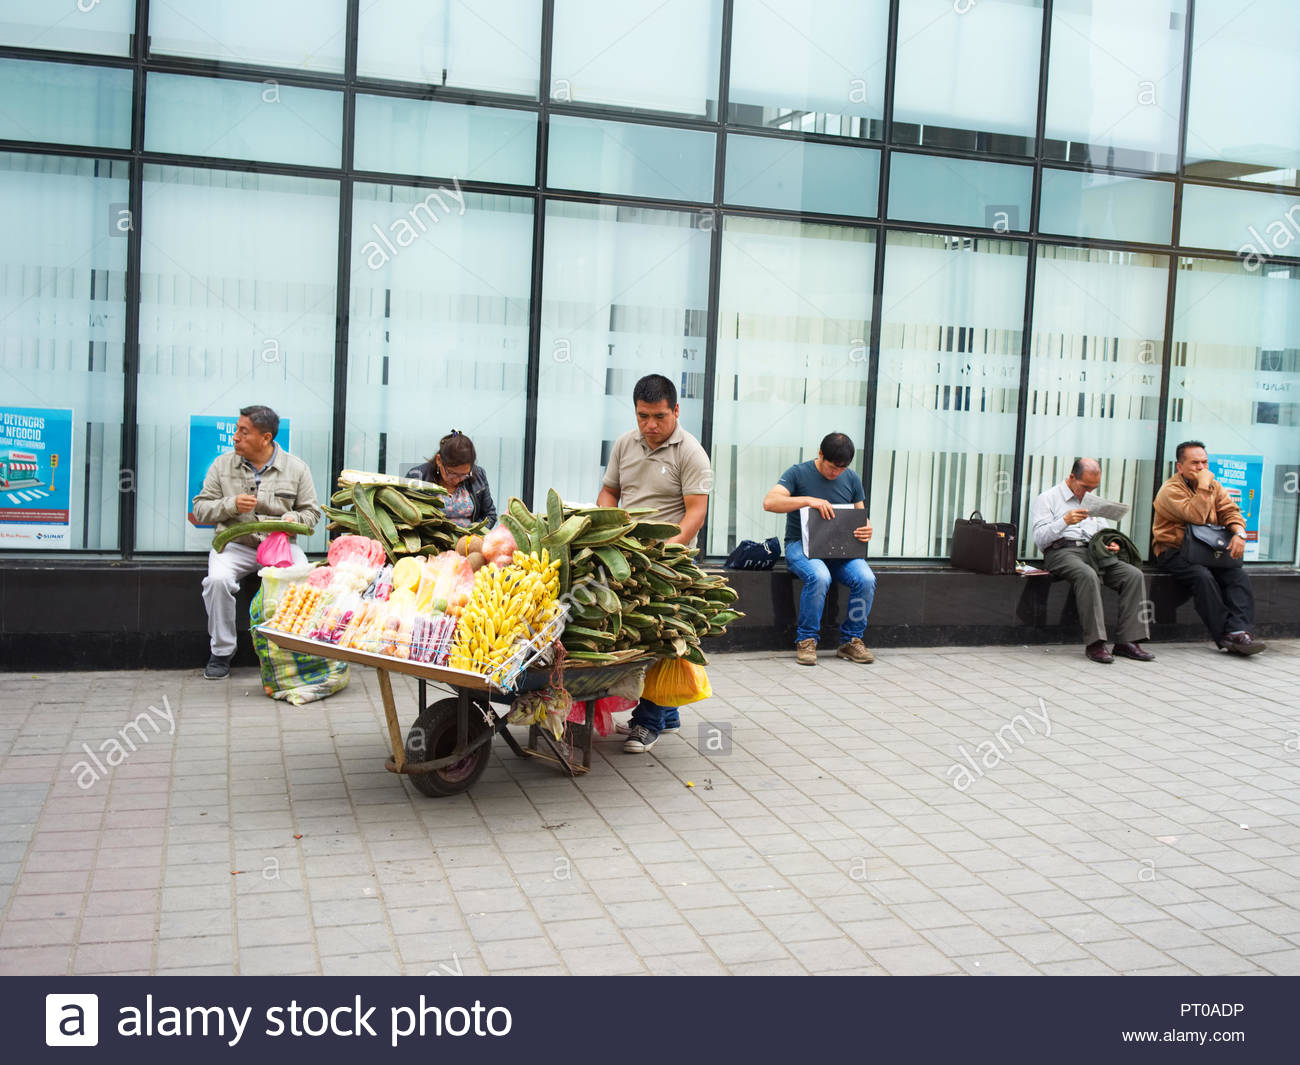 Street seller sells fruit on the pedestrian street in Trujillo Peru - Stock Image